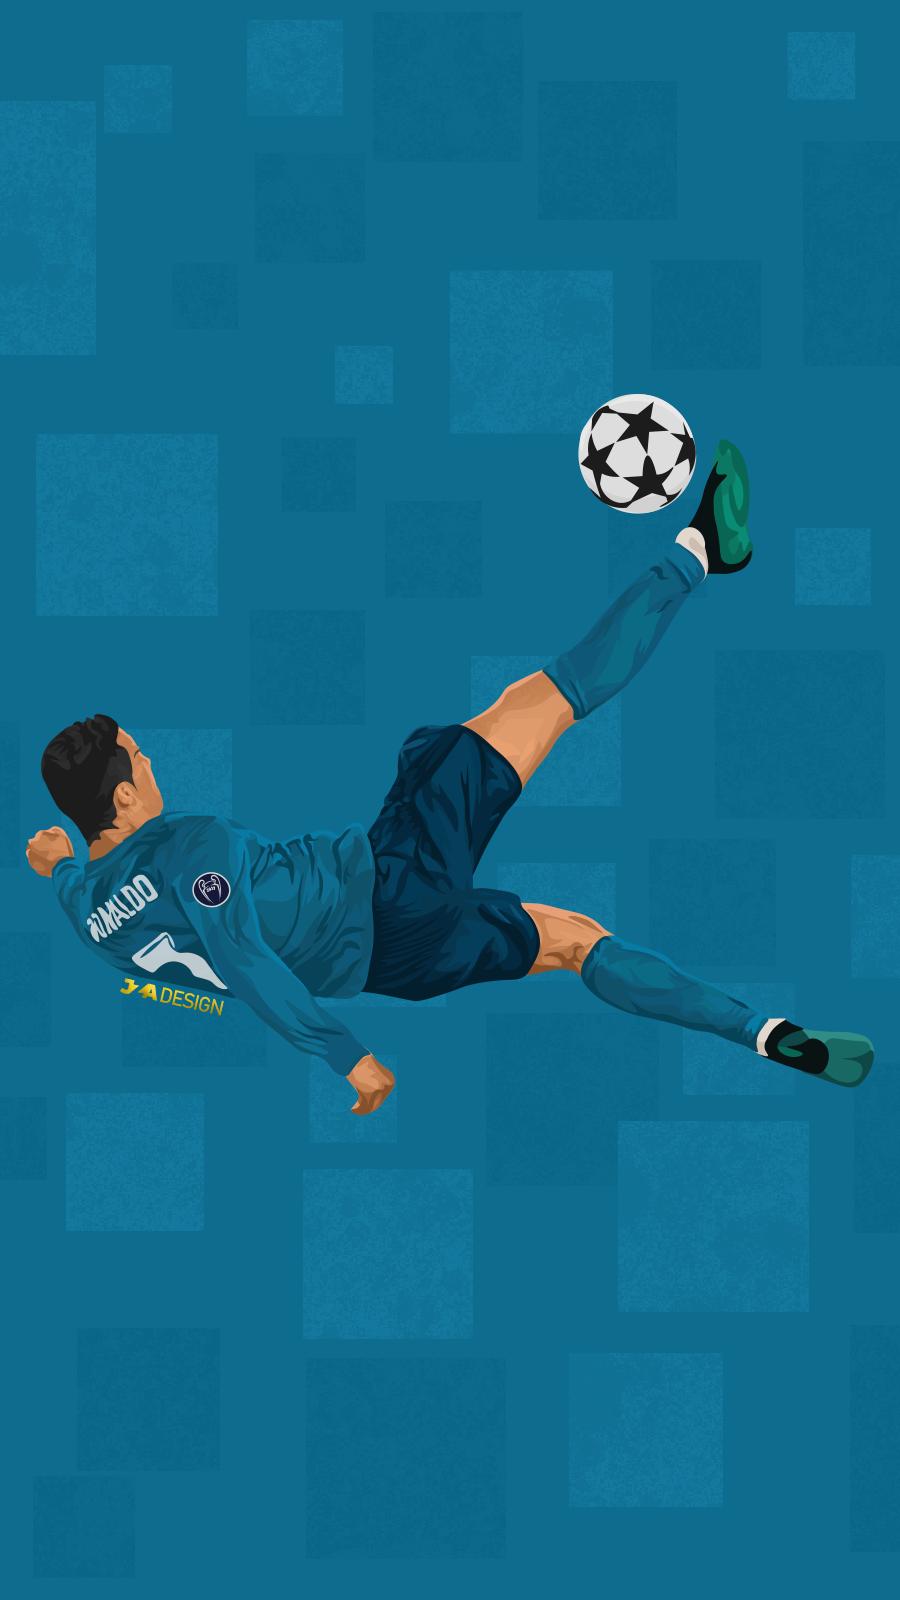 Cristiano Ronaldo Overhead Kick Vs Juventus Ronaldo Wallpapers Cristiano Ronaldo Juventus Ronaldo Football